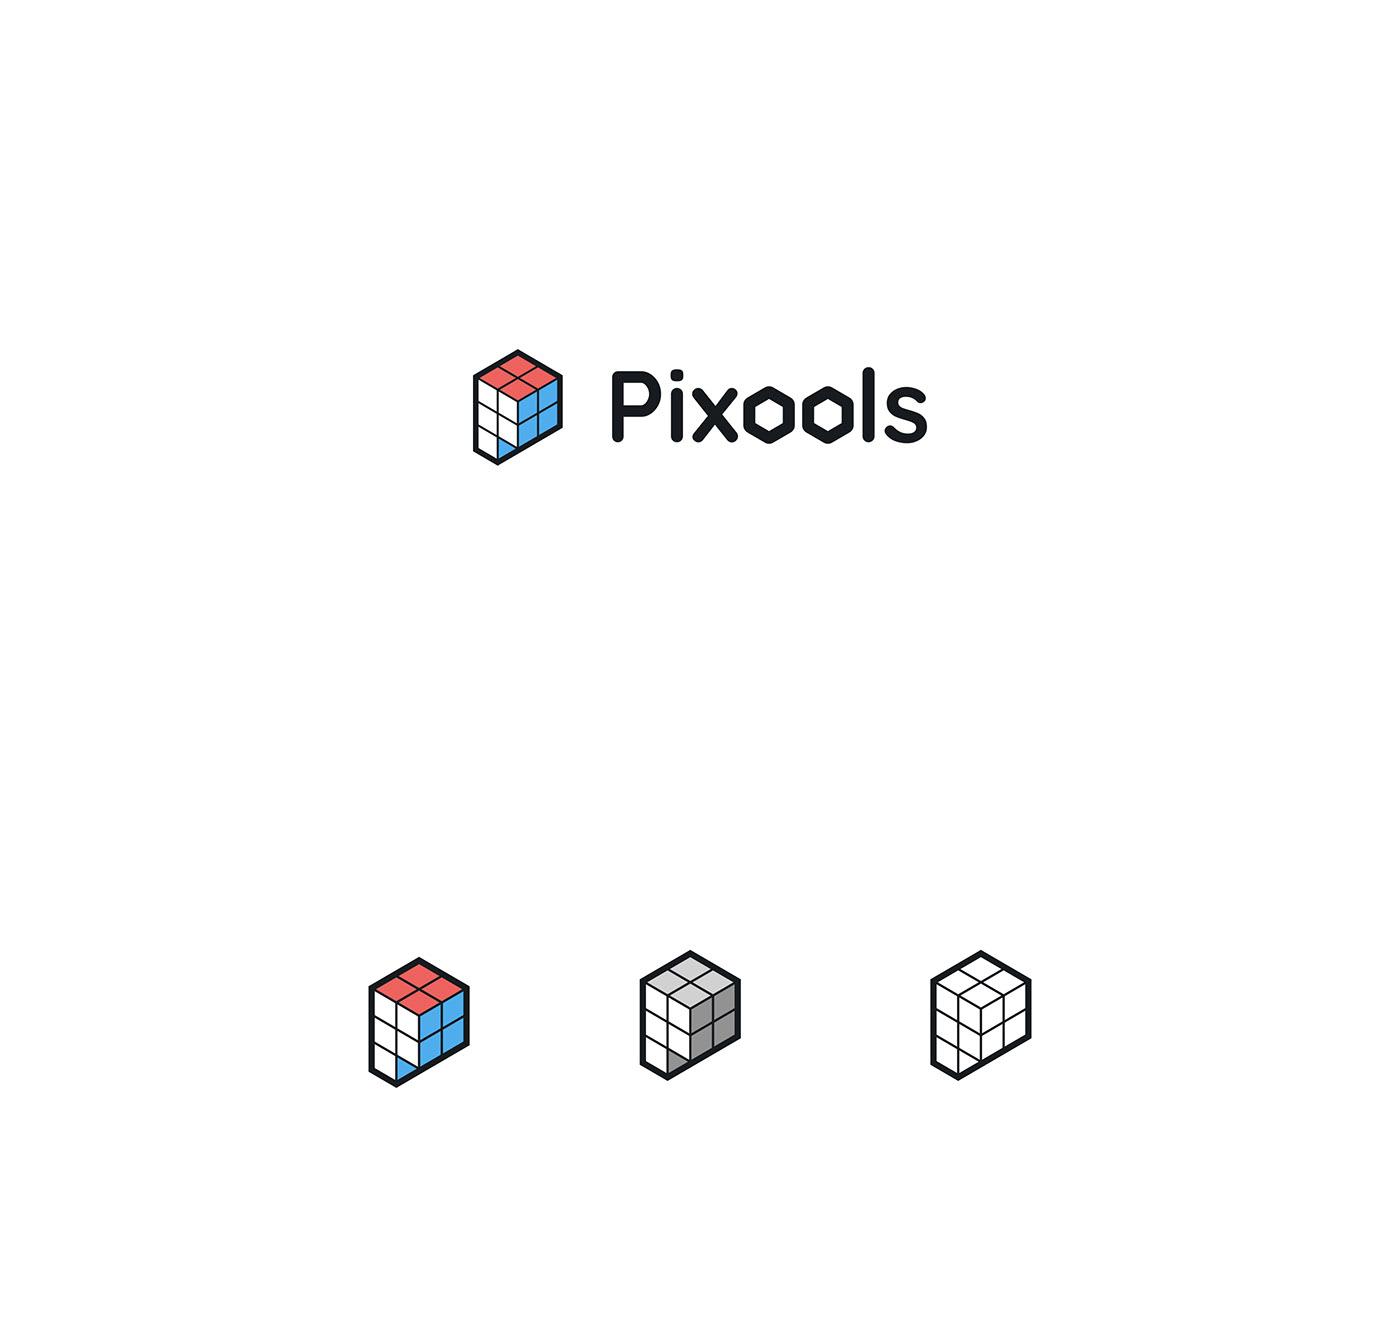 pixels pixools tools branding  brand cubes animation